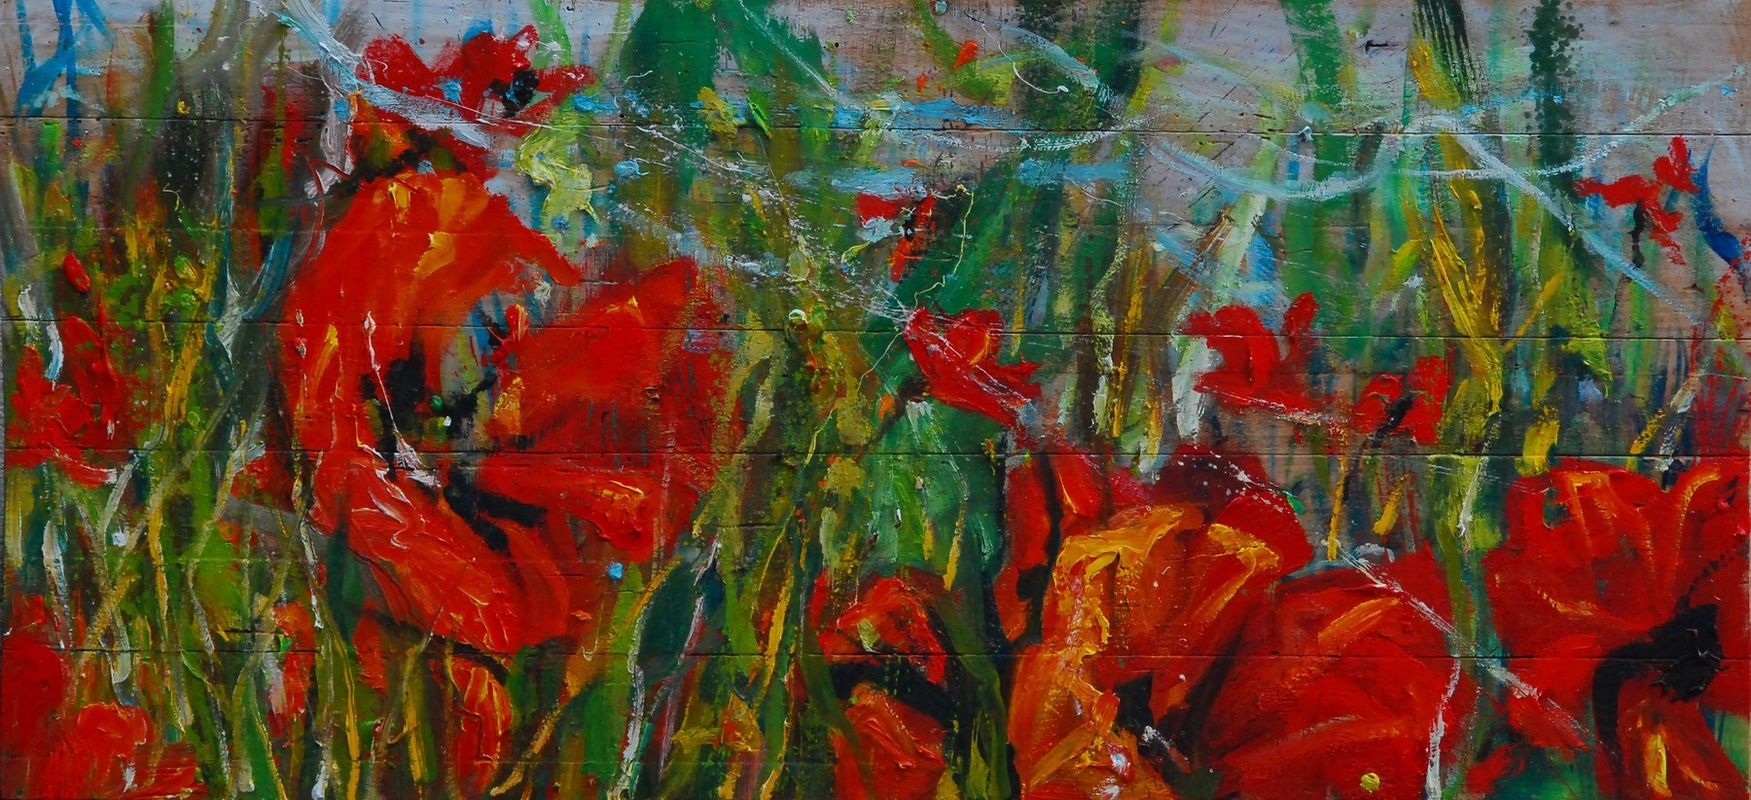 Martina Dalla Stella - Papaveri, olio su tavola, 55x180 cm, 2015